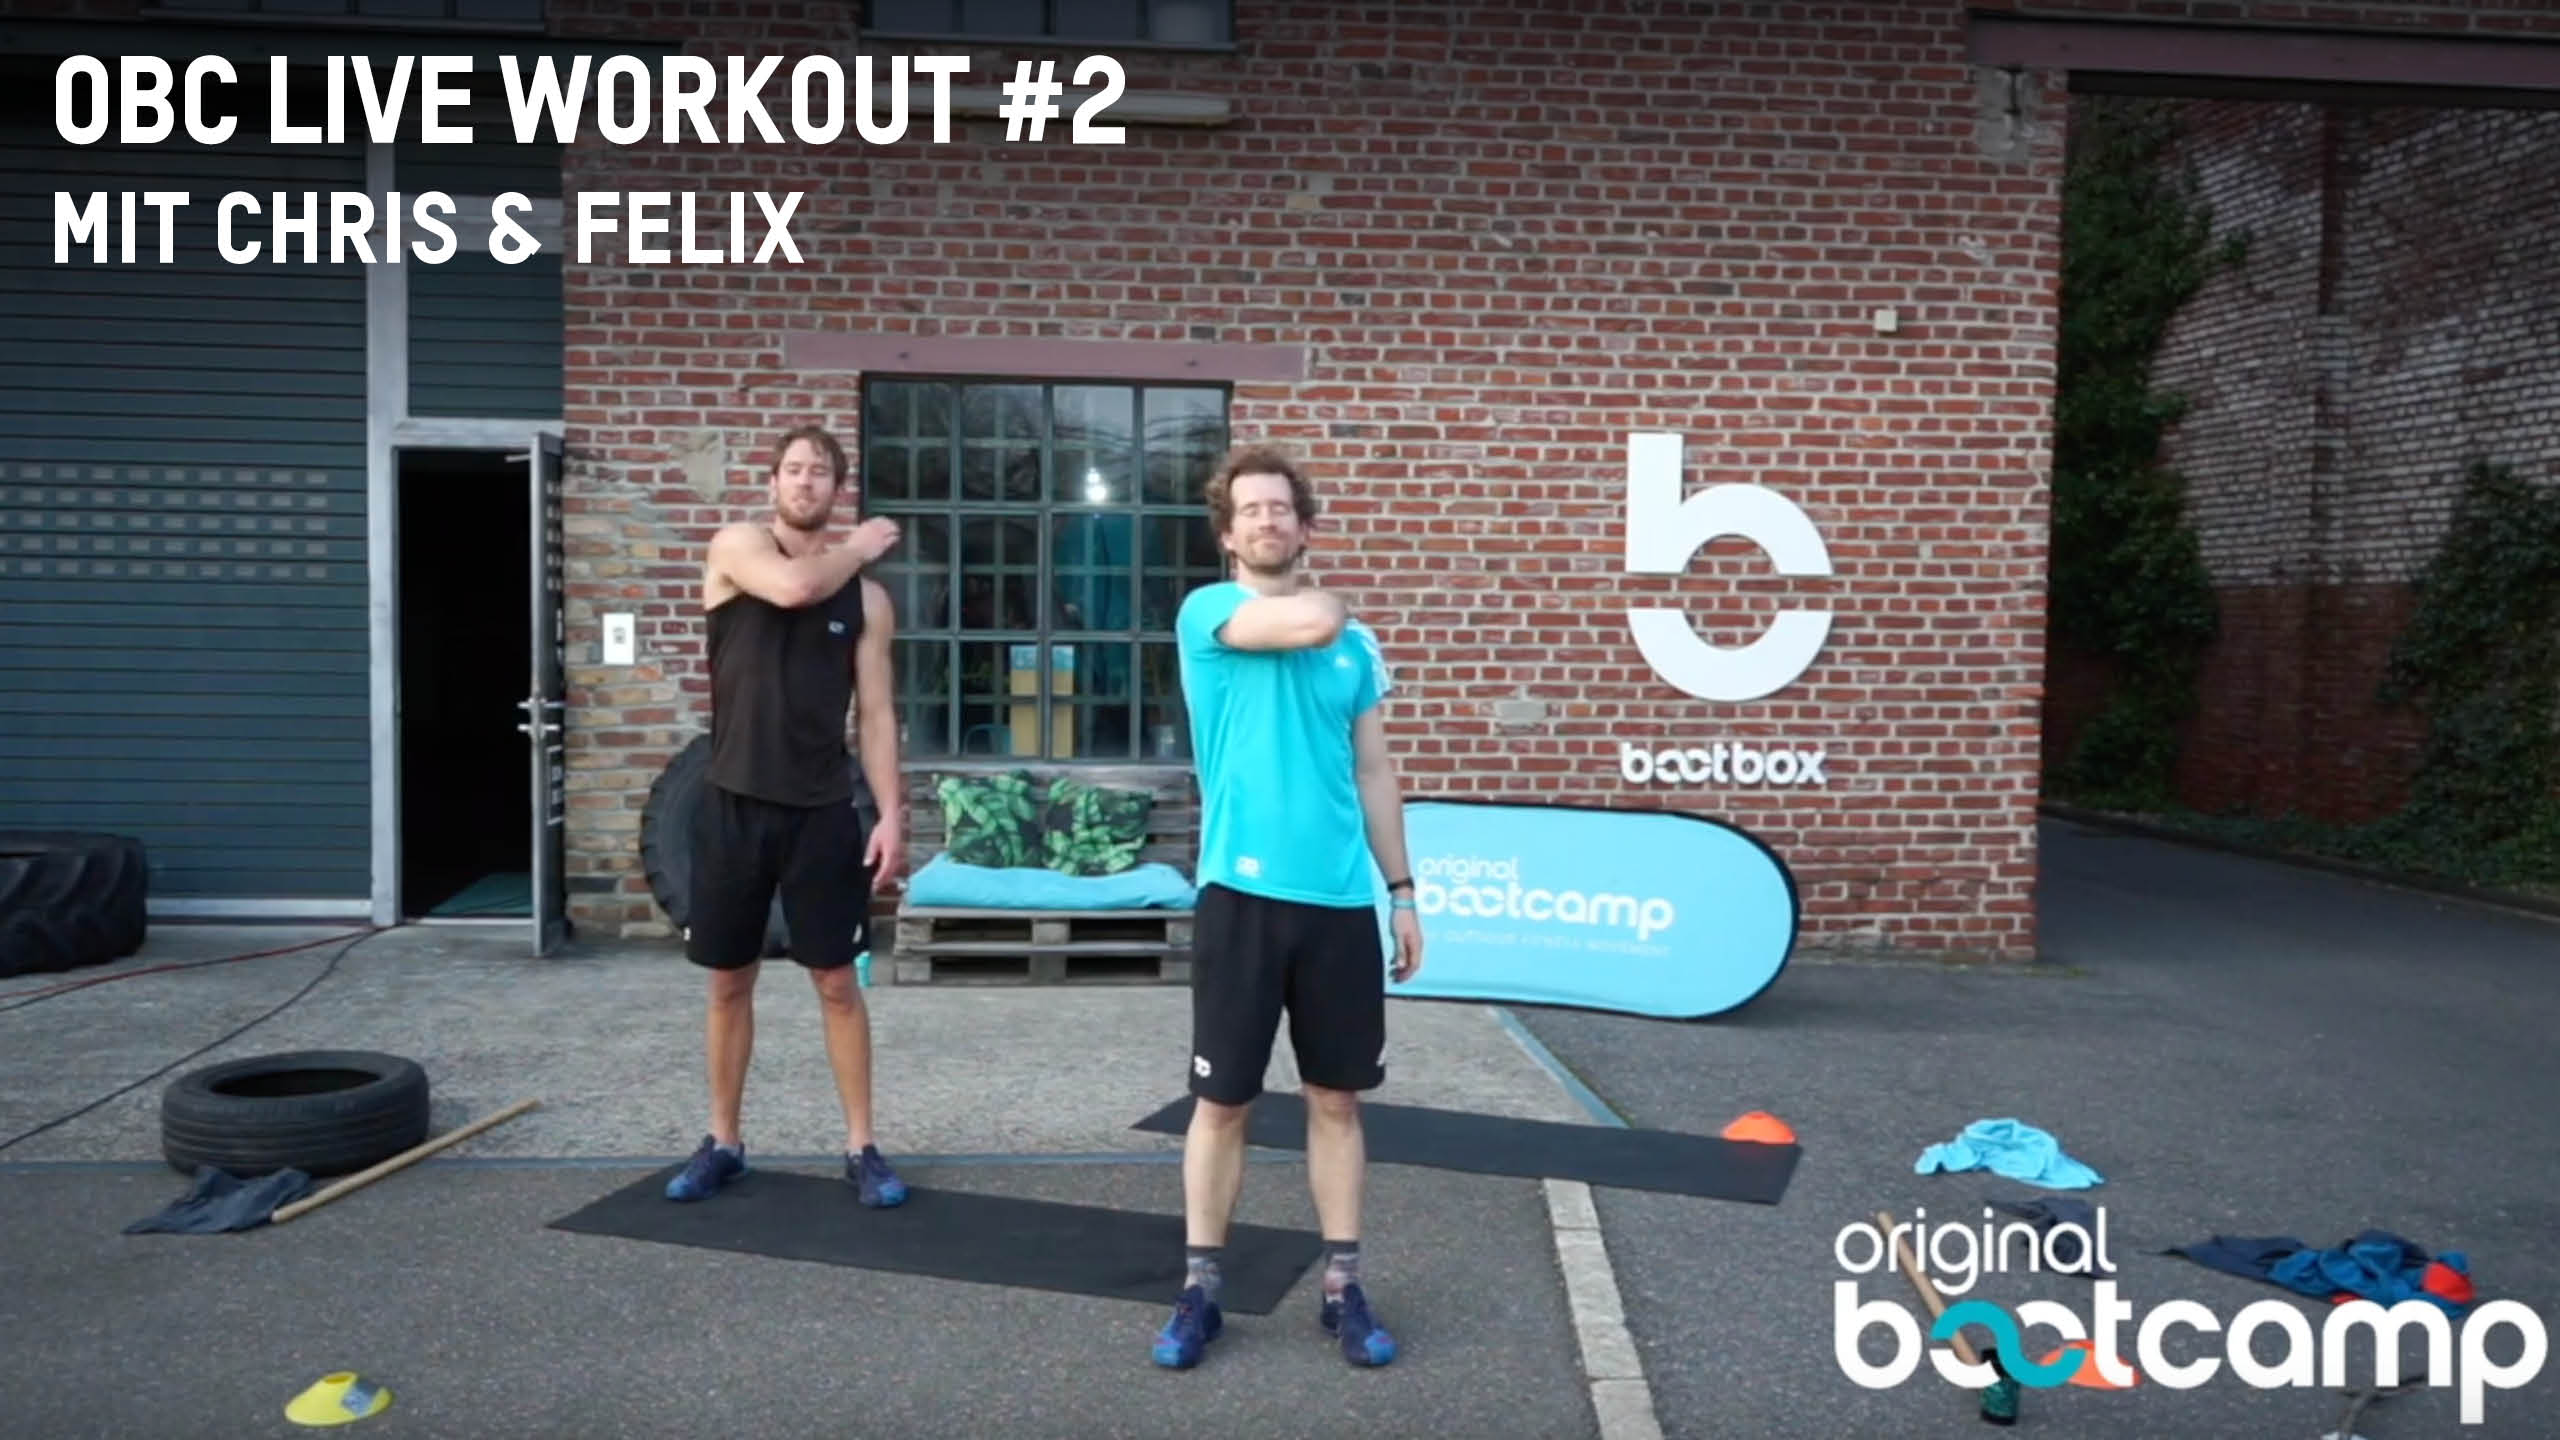 Original Bootcamp Facebook Live Workout #2